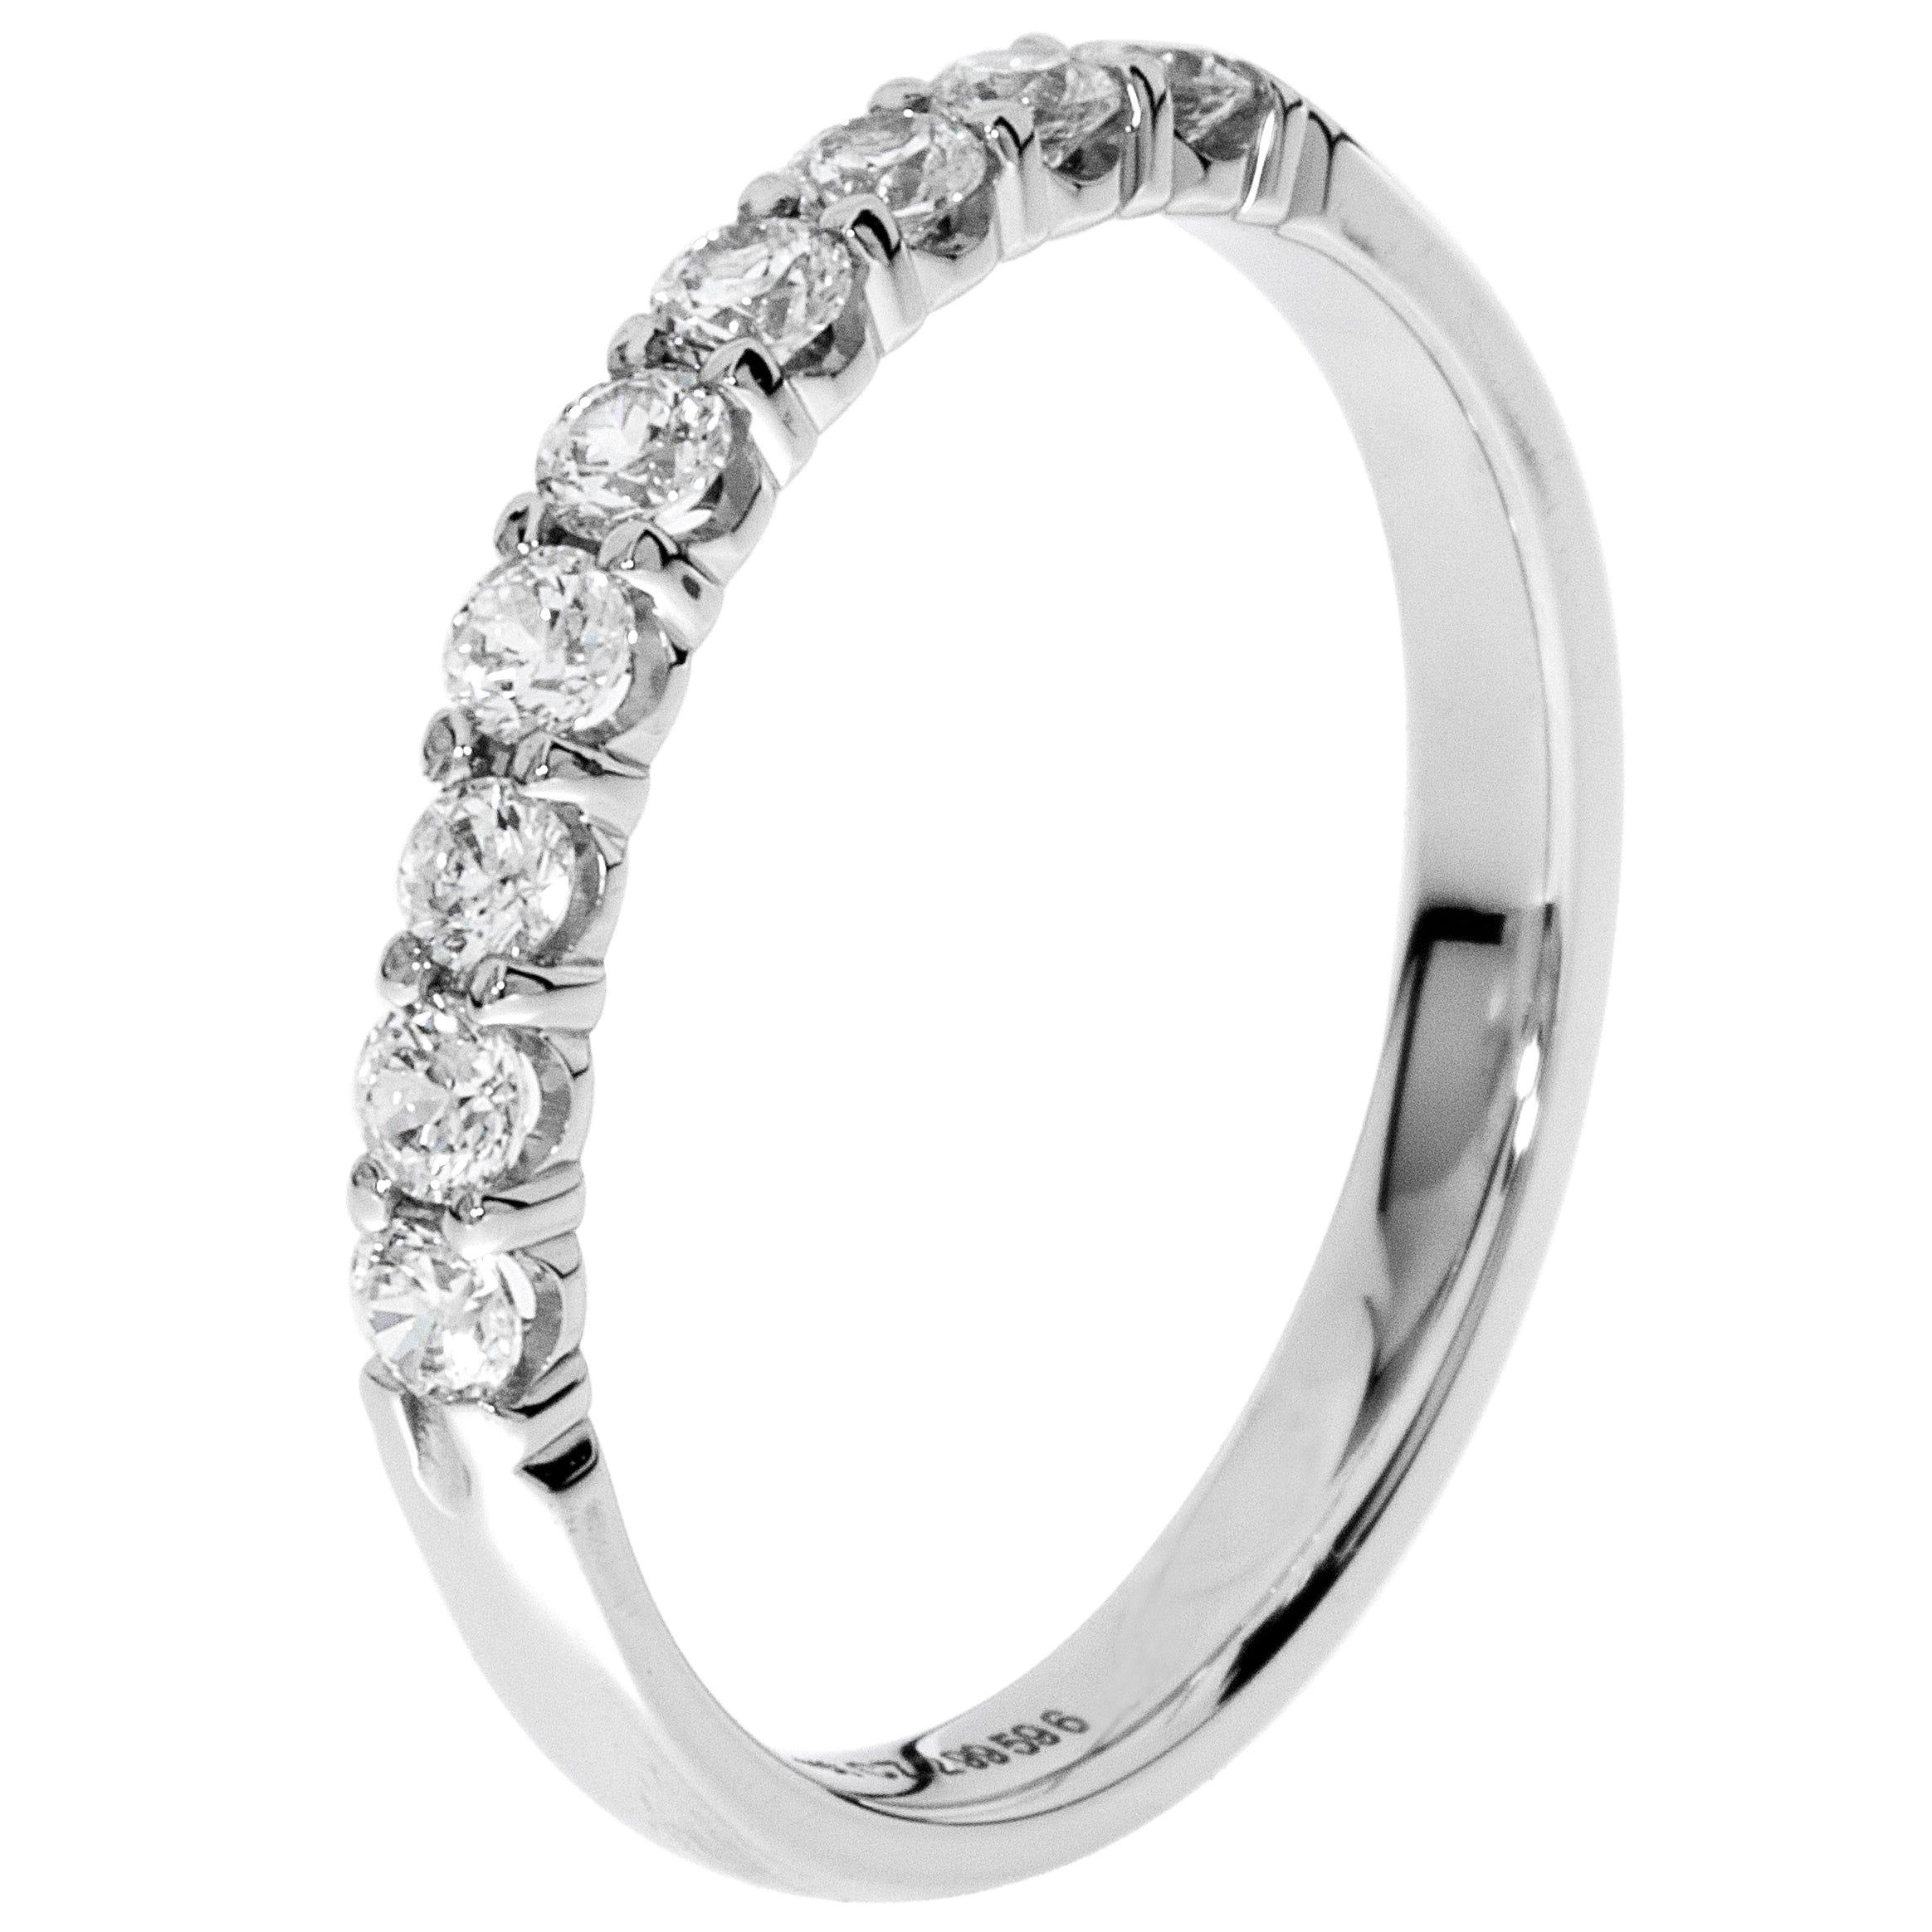 9-Stone Diamond Band 1/3 ctw. (G-H, SI2) 10k White Gold